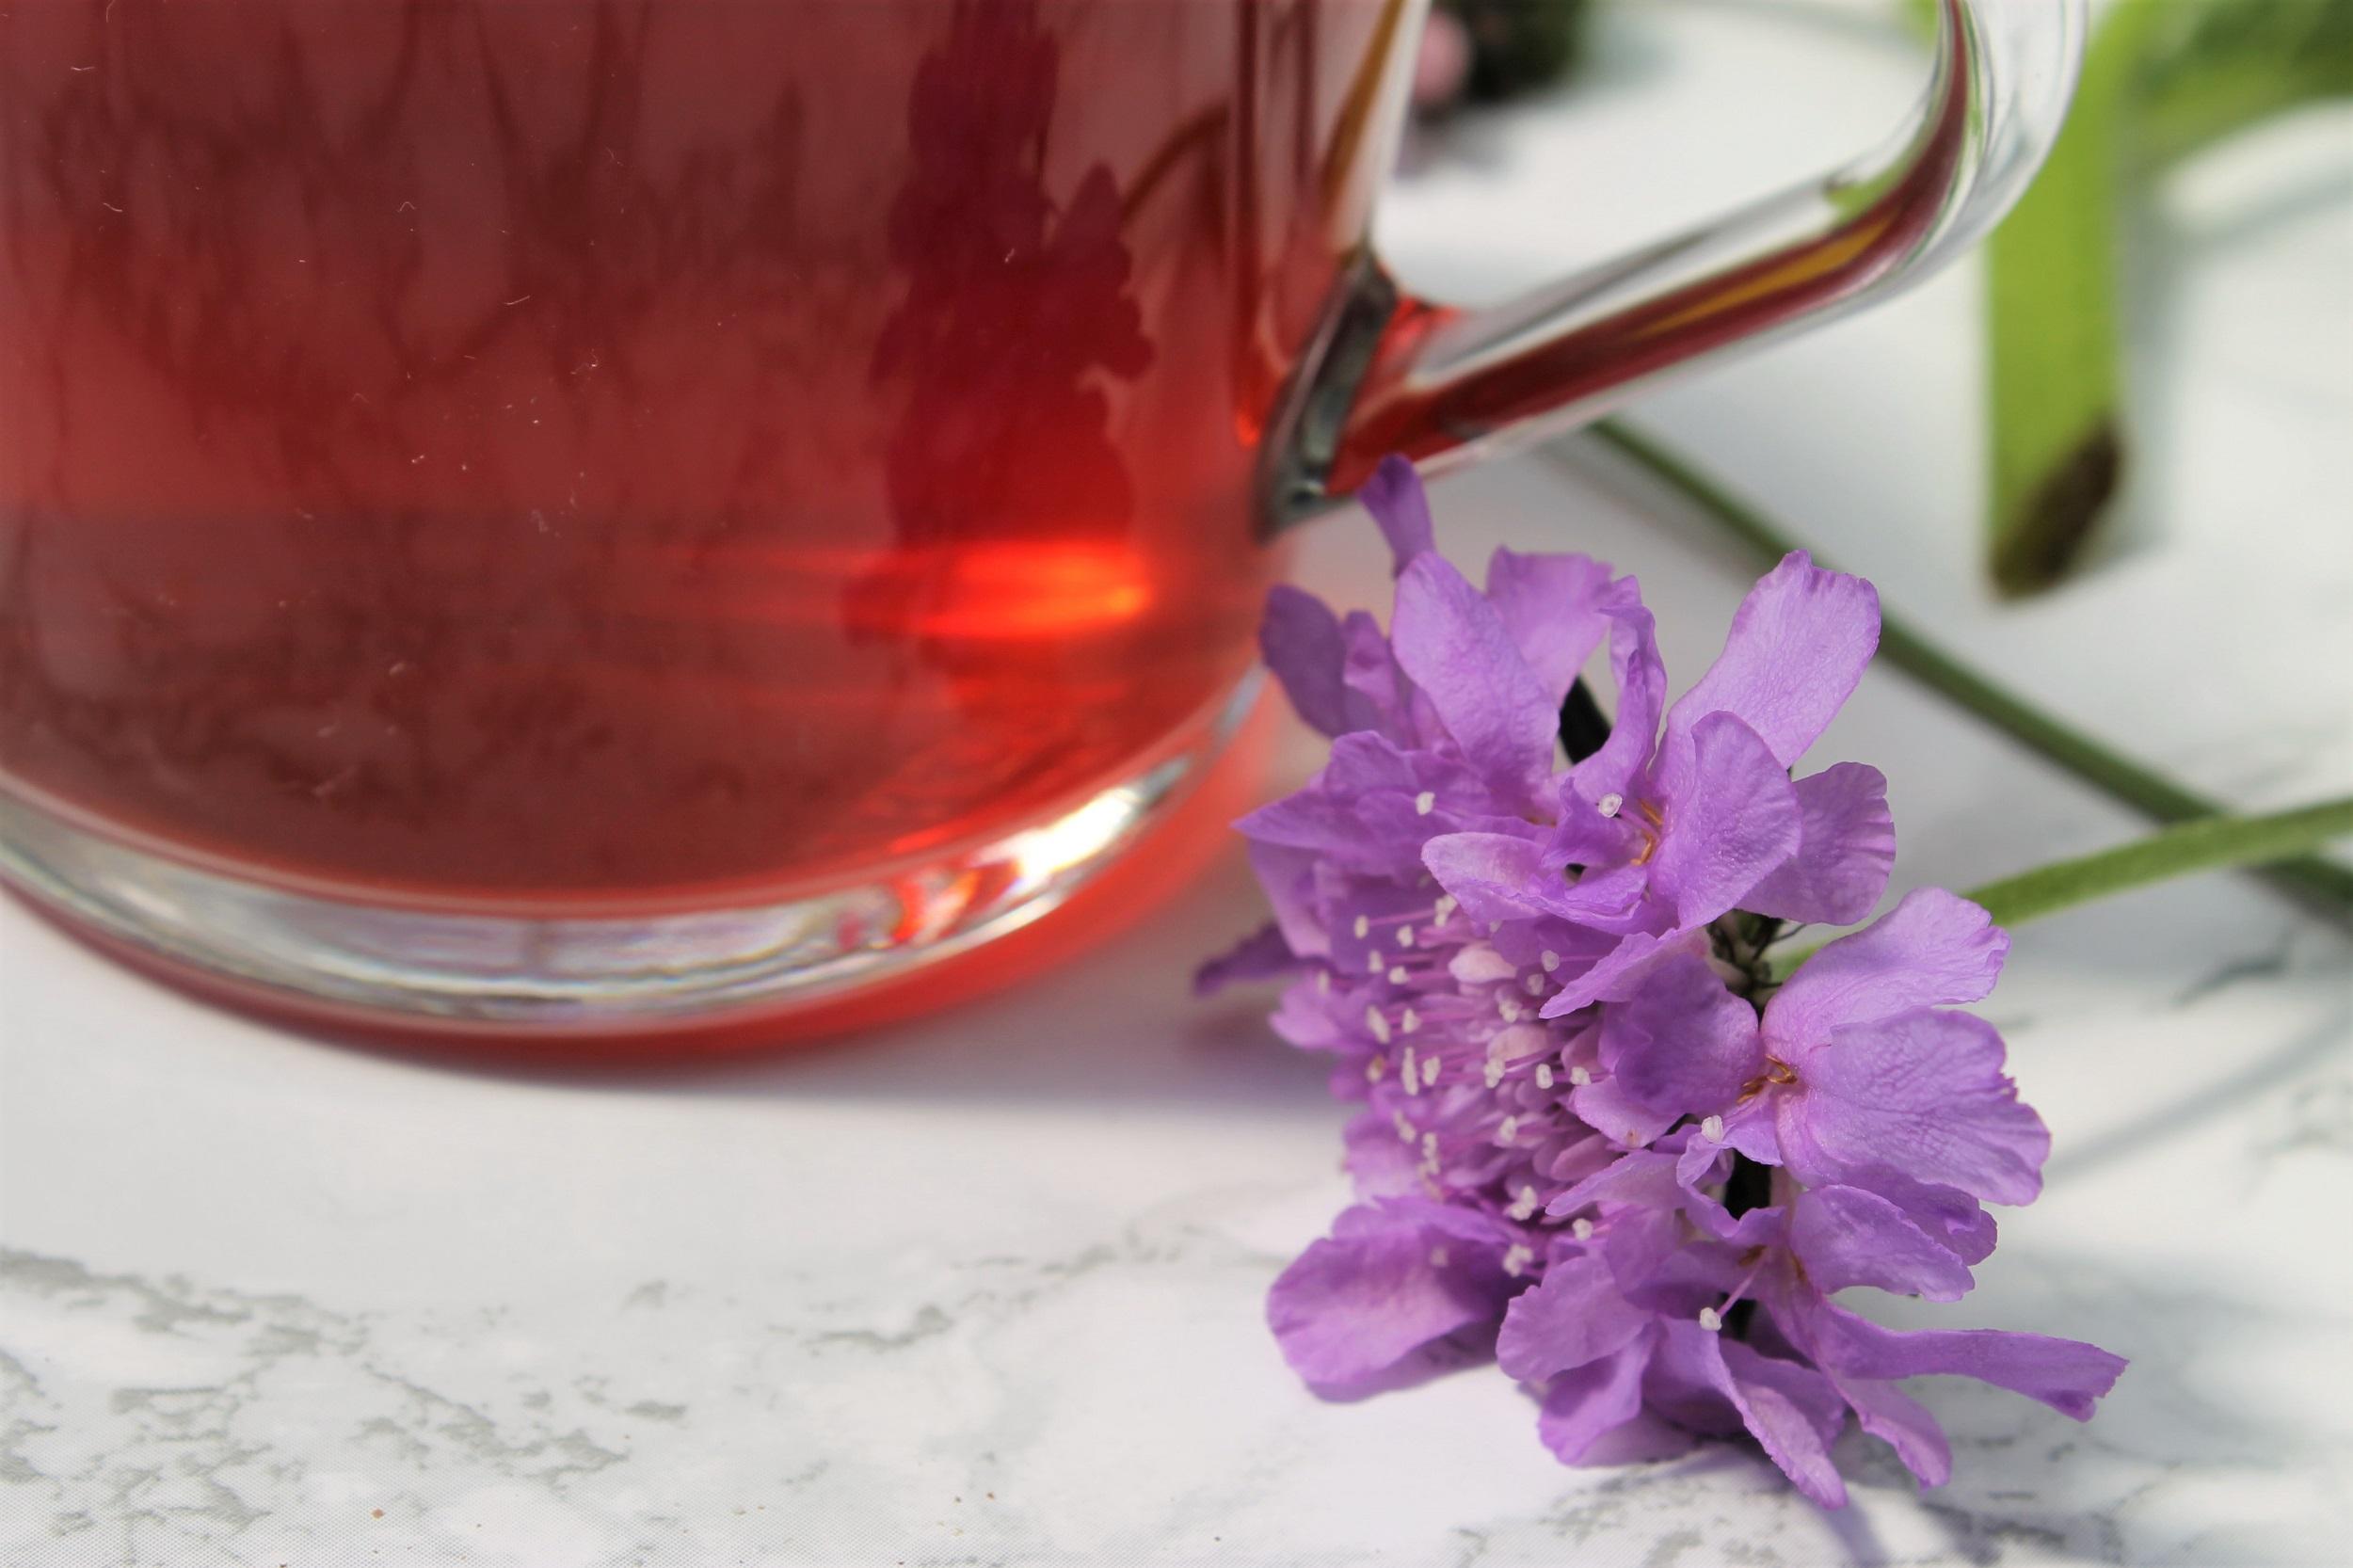 flowers and fruit tea image